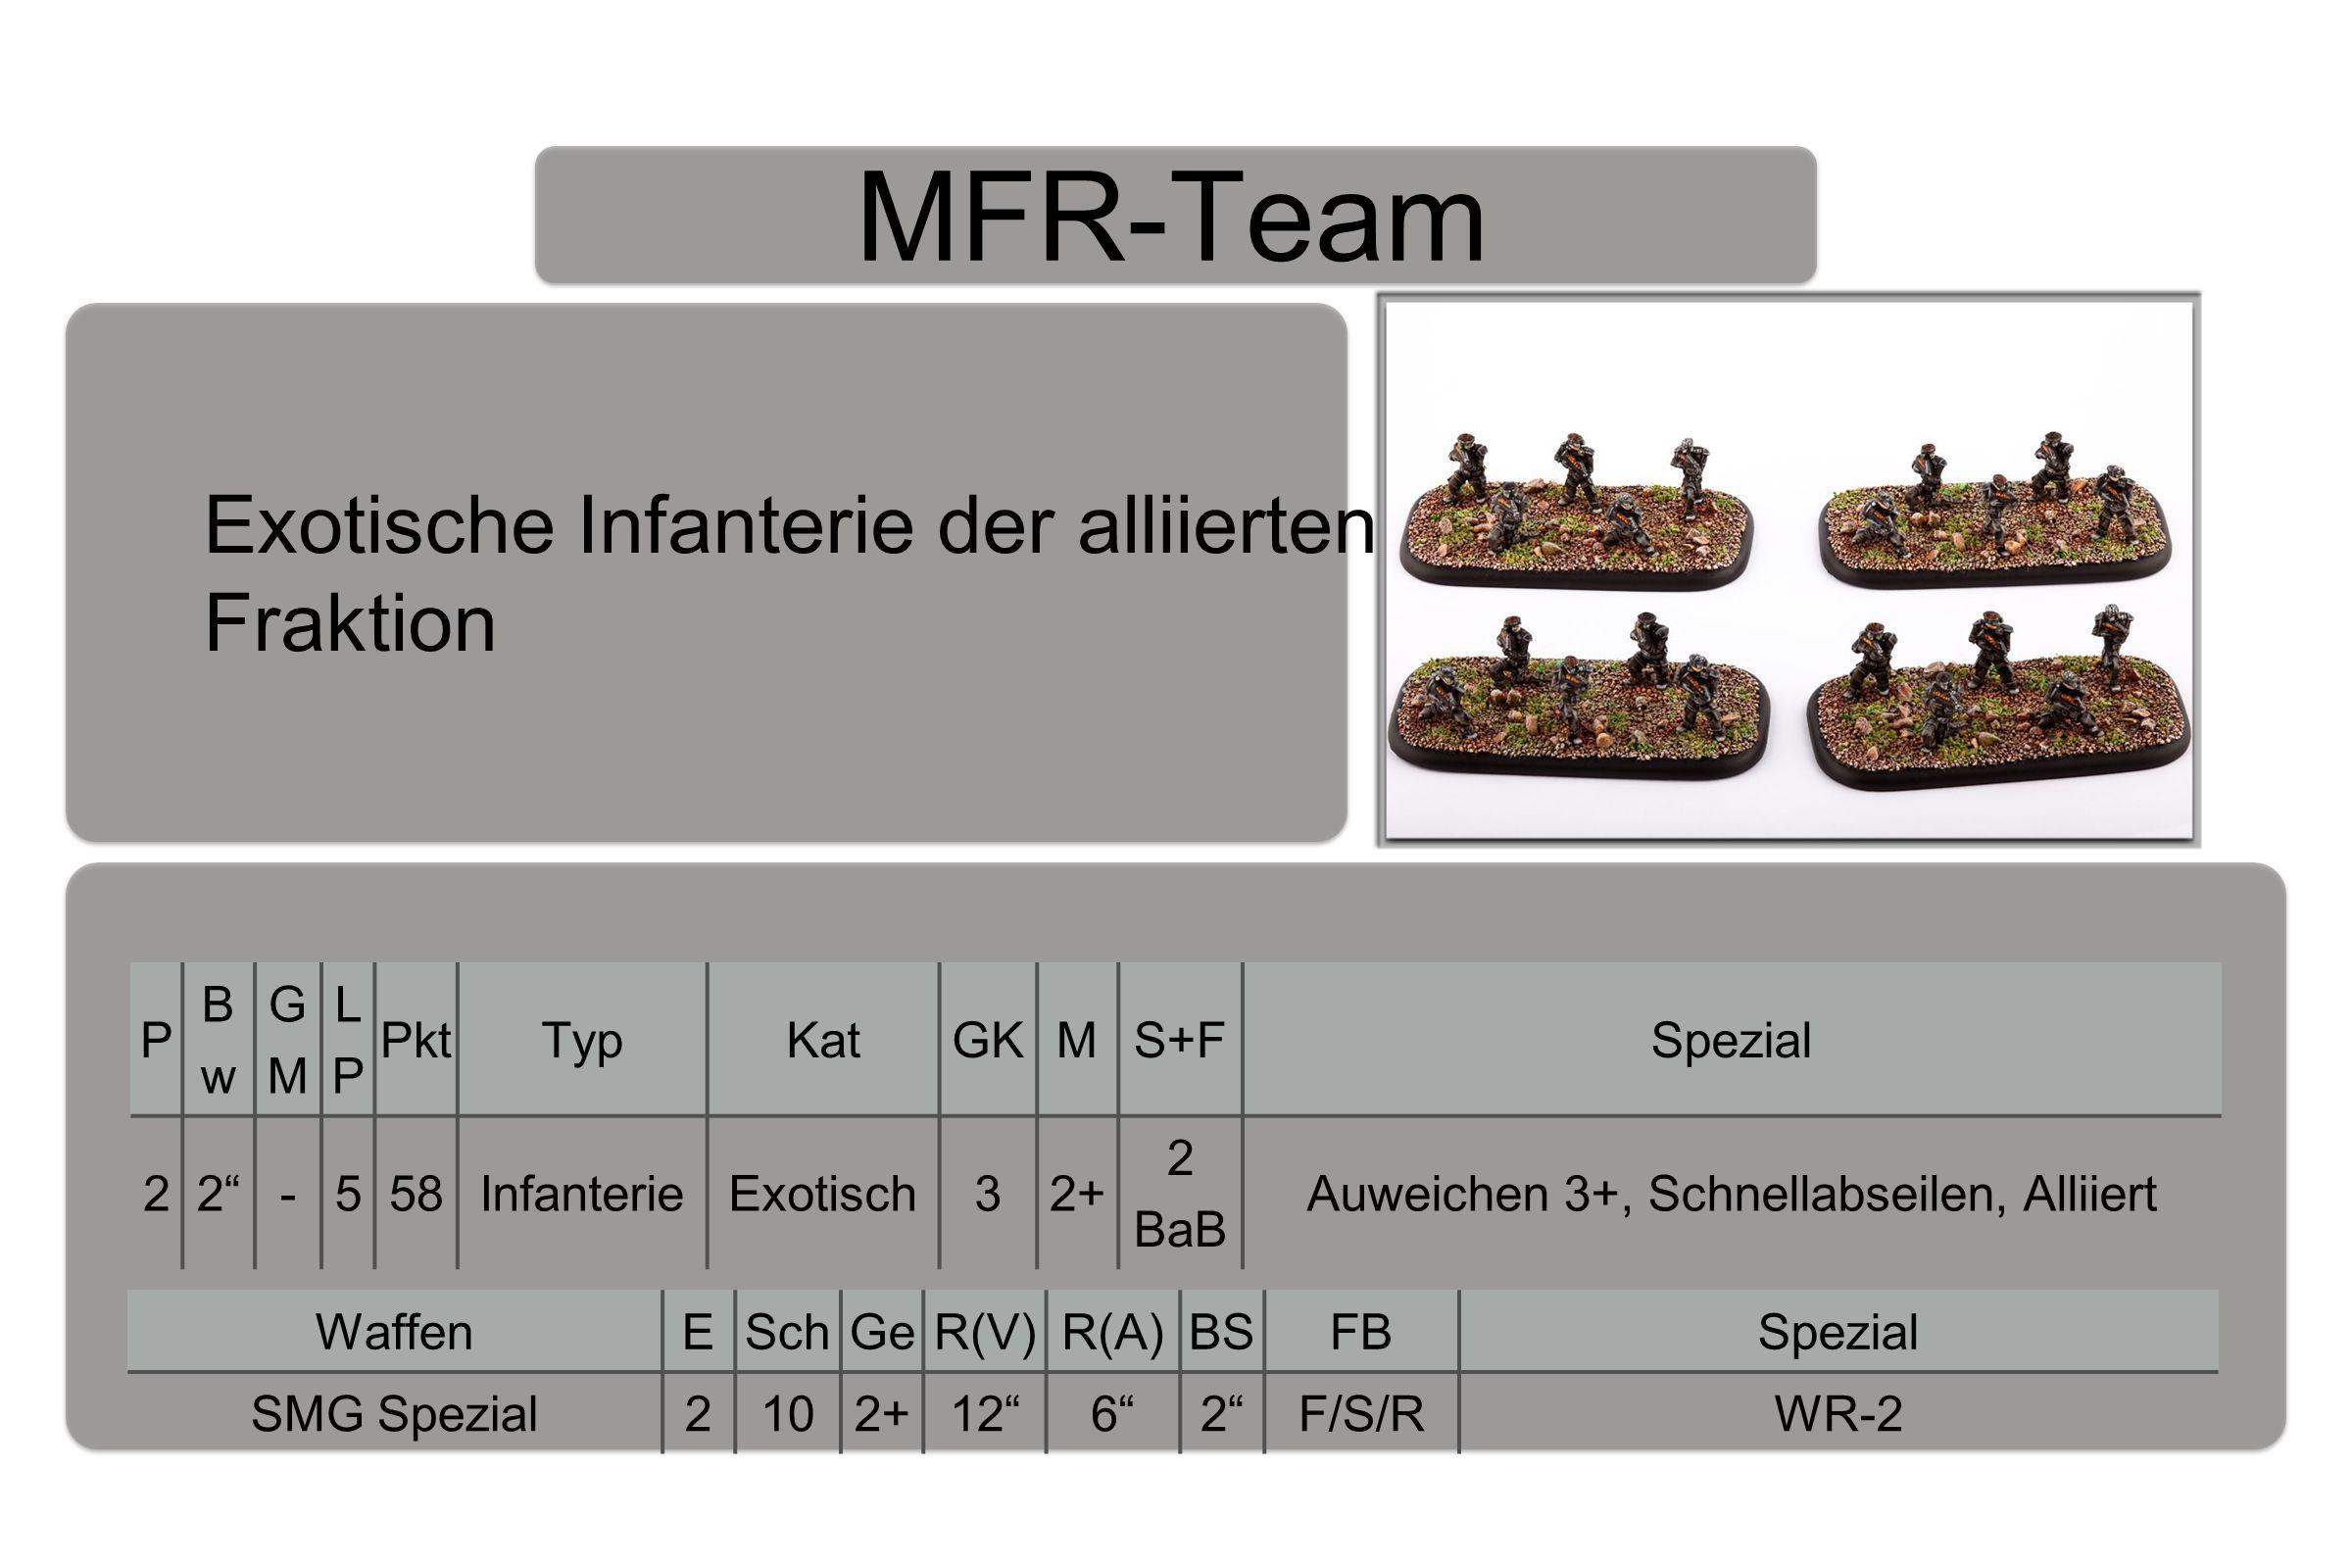 MFR-Team P BwBw GMGM LPLP PktTypKatGKMS+FSpezial 22 -558InfanterieExotisch32+ 2 BaB Auweichen 3+, Schnellabseilen, Alliiert WaffenESchGeR(V)R(A)BSFBSpezial SMG Spezial2102+12 6 2 F/S/RWR-2 Exotische Infanterie der alliierten Fraktion